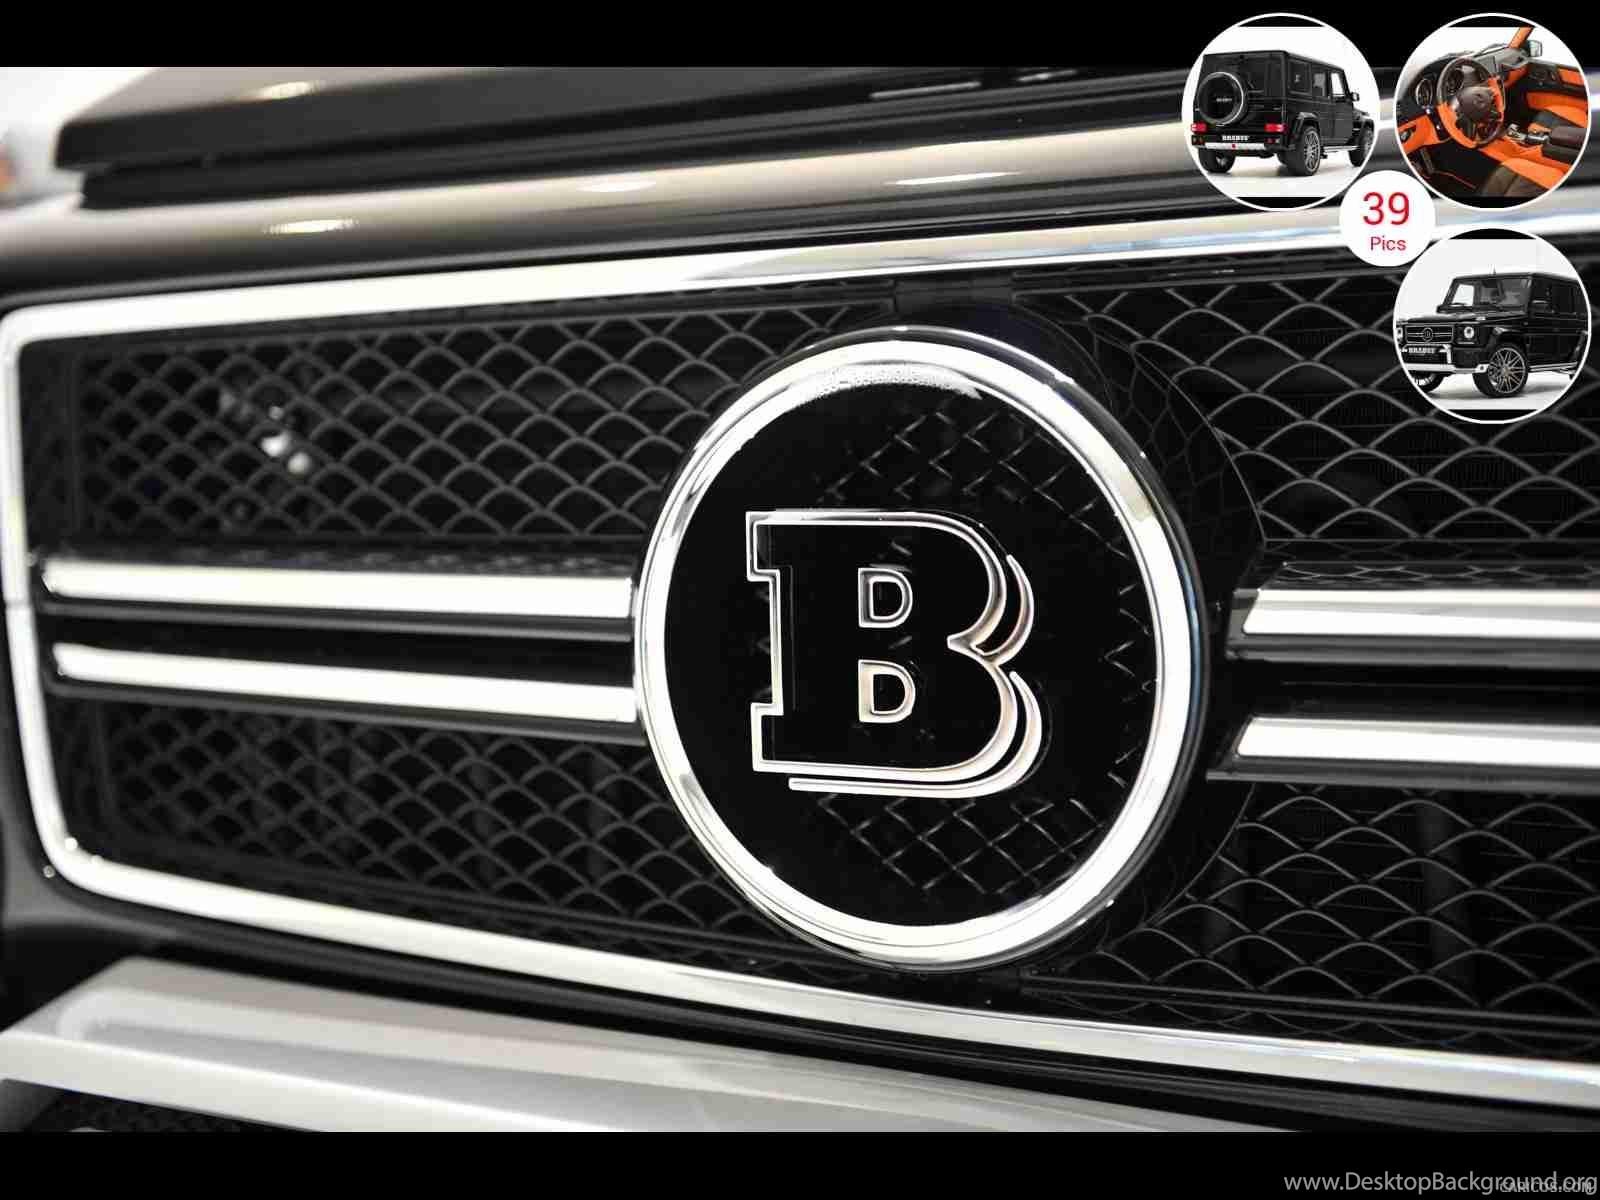 2013 BRABUS B63 620 WIDESTAR Based M Benz G63 AMG Badge Grill